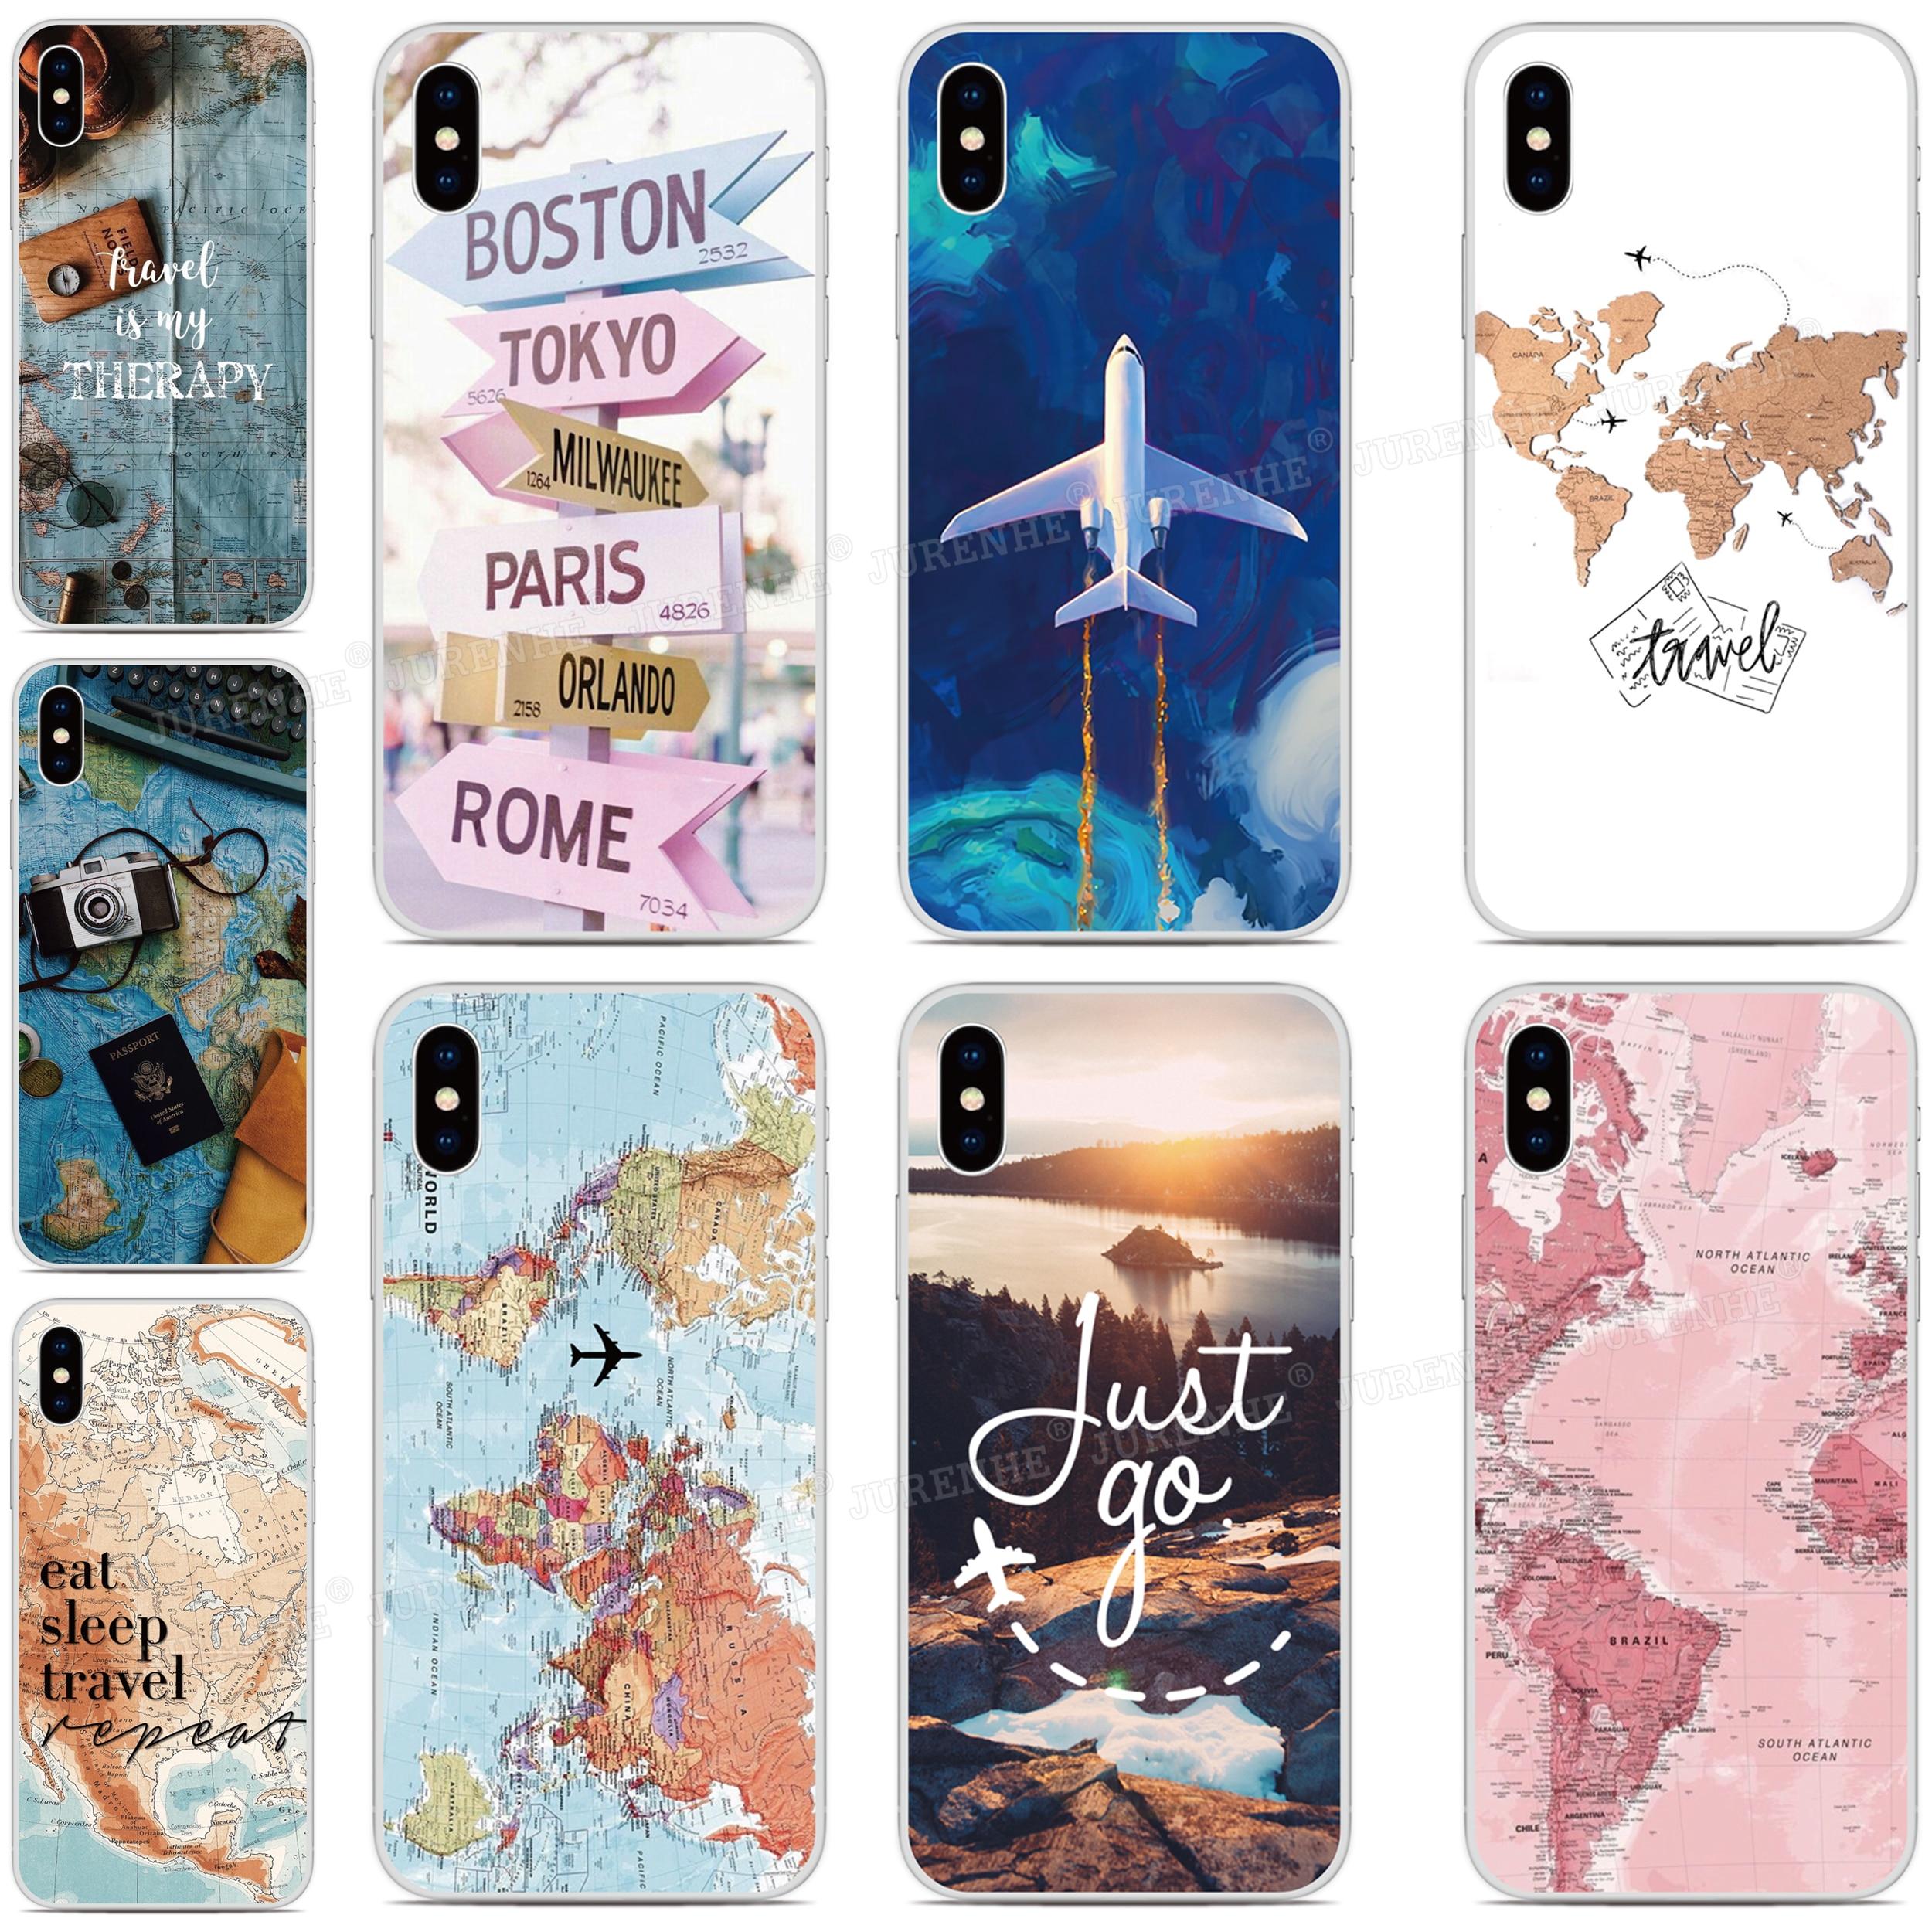 World Map Plane Cover For LG Q70 K61 K51s K50s K40s Q60 K50 K40 K30 K20 Stylo 5 4 G7 G8 G8X G8S V50 V60 V50s Thinq Phone Case